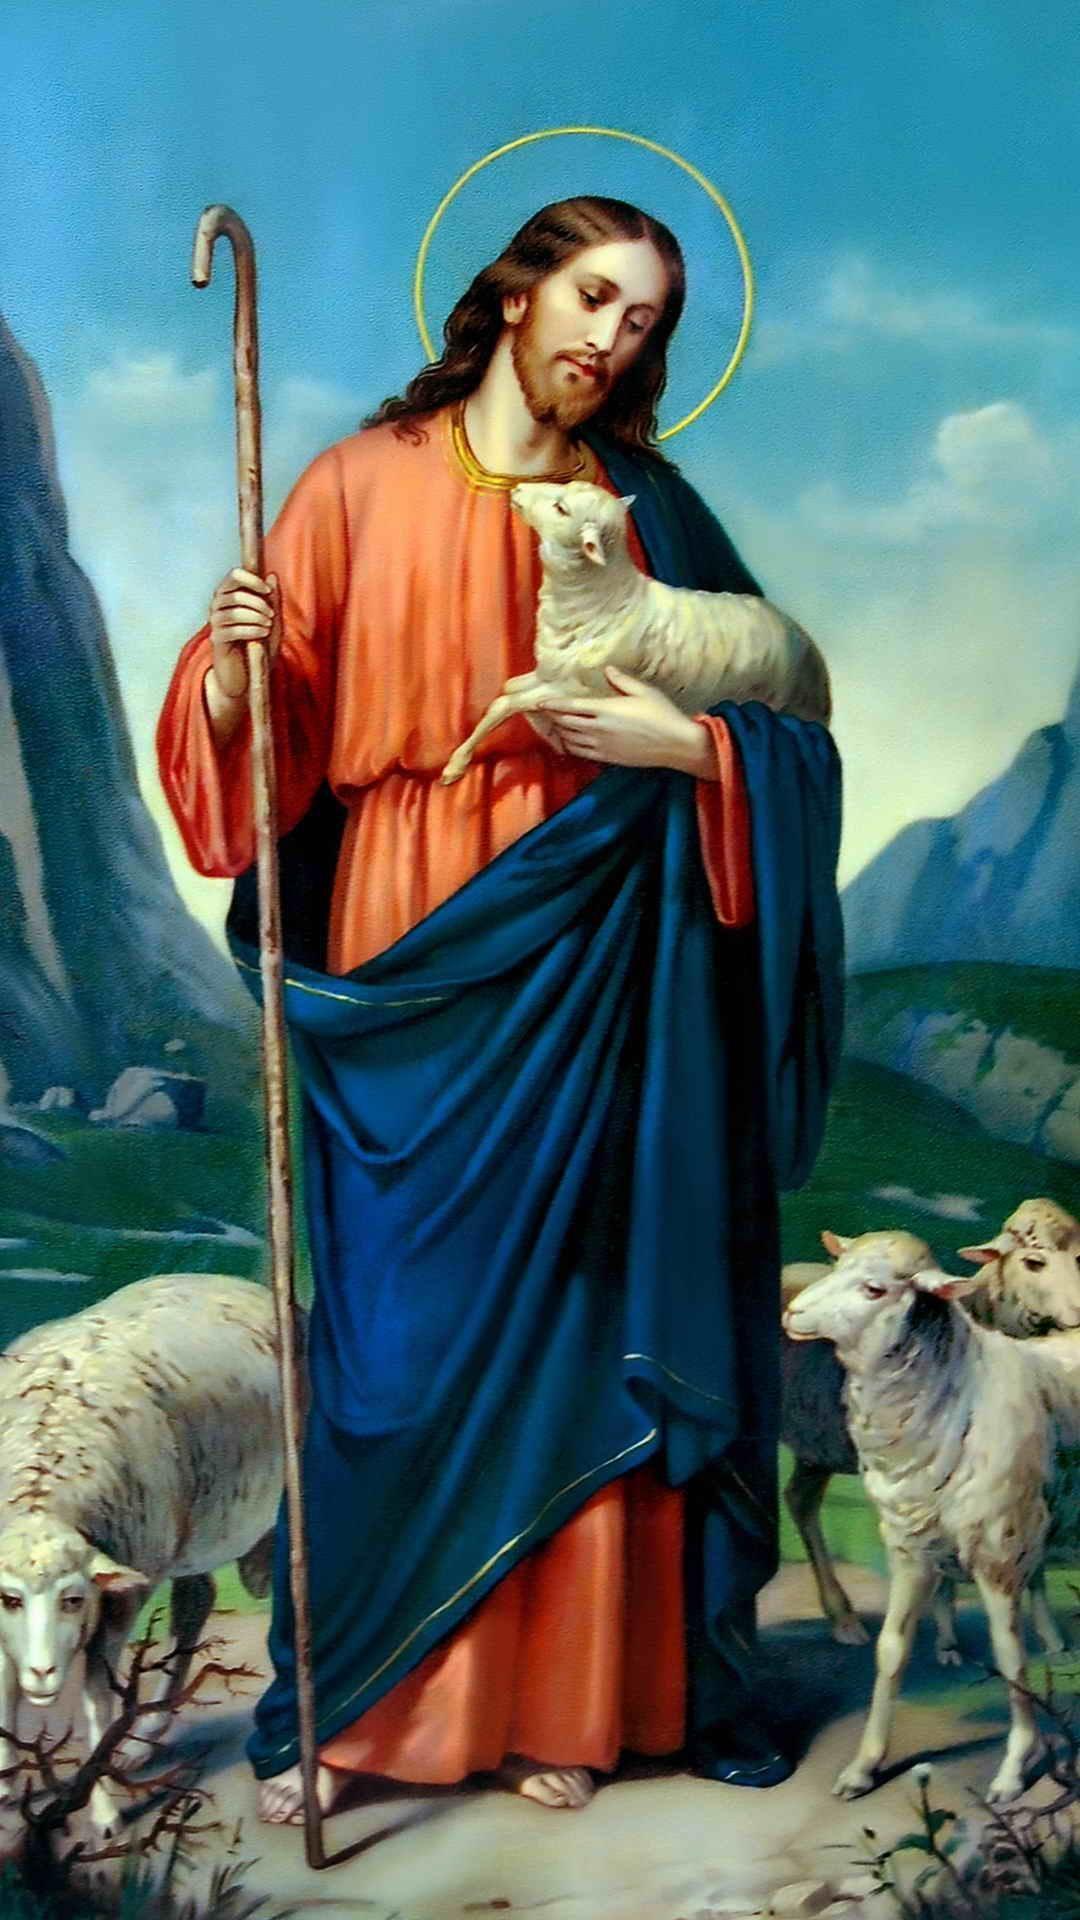 Jesus Background Image In 2020 Jesus Wallpaper Jesus Background Background Images